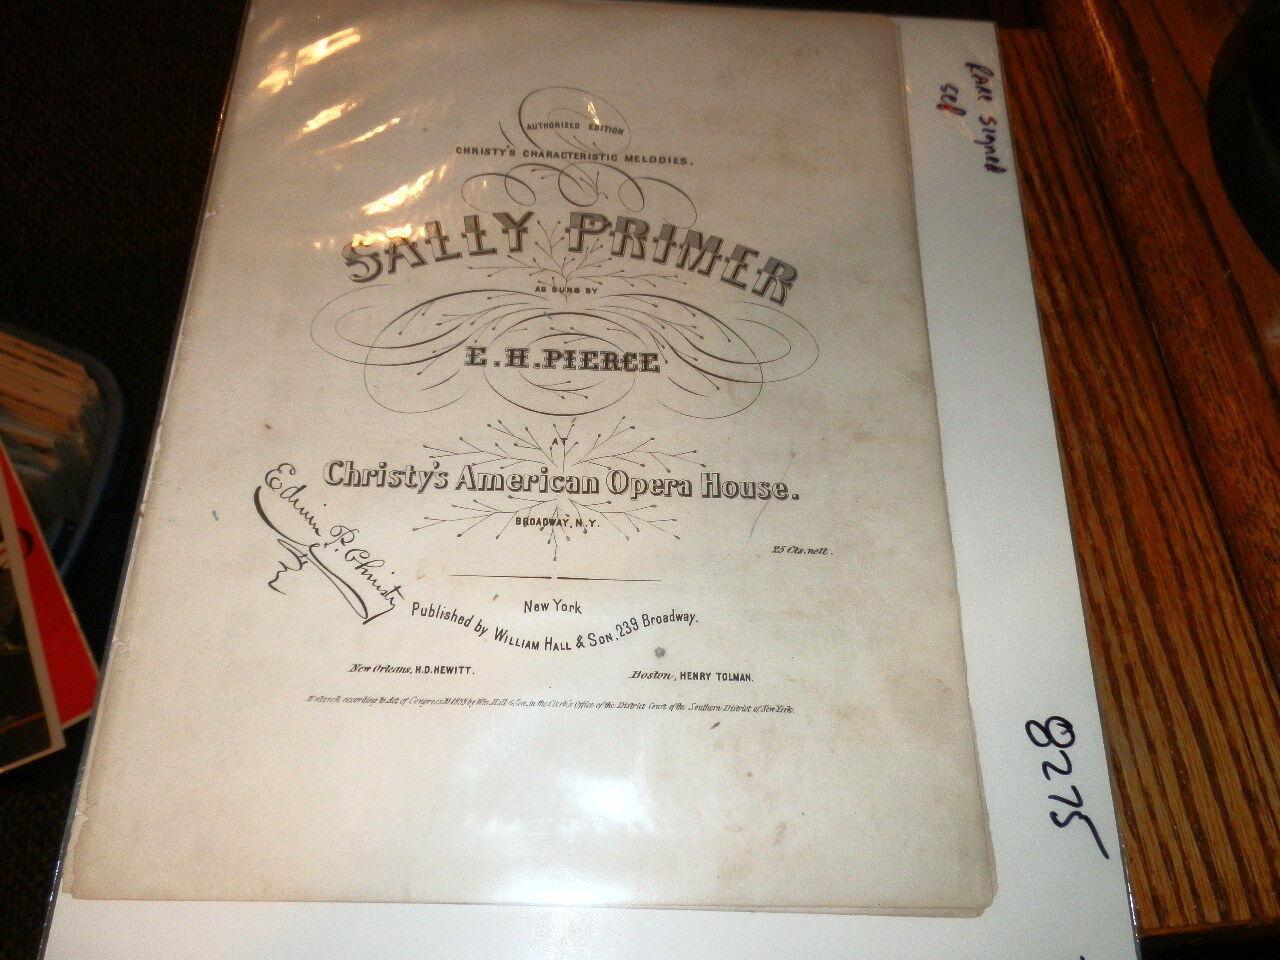 8275,Sally Primer,Signed,Christy's Opera House,1853 Sheet Music